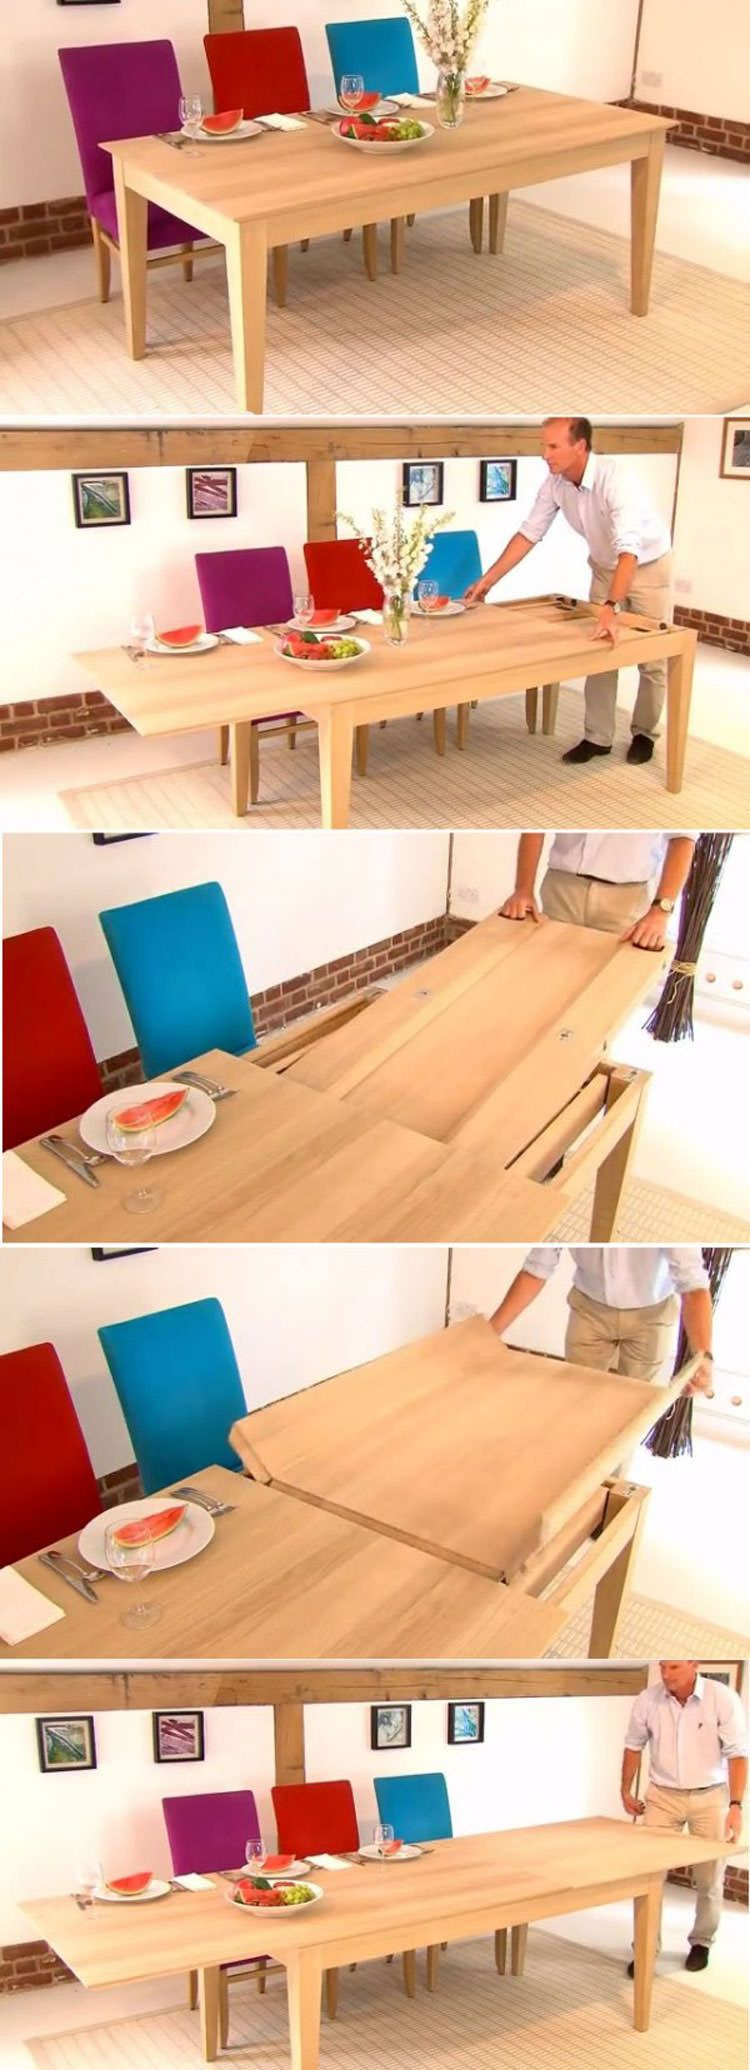 30 tavoli allungabili moderni dal design particolare for Tavoli legno moderni allungabili